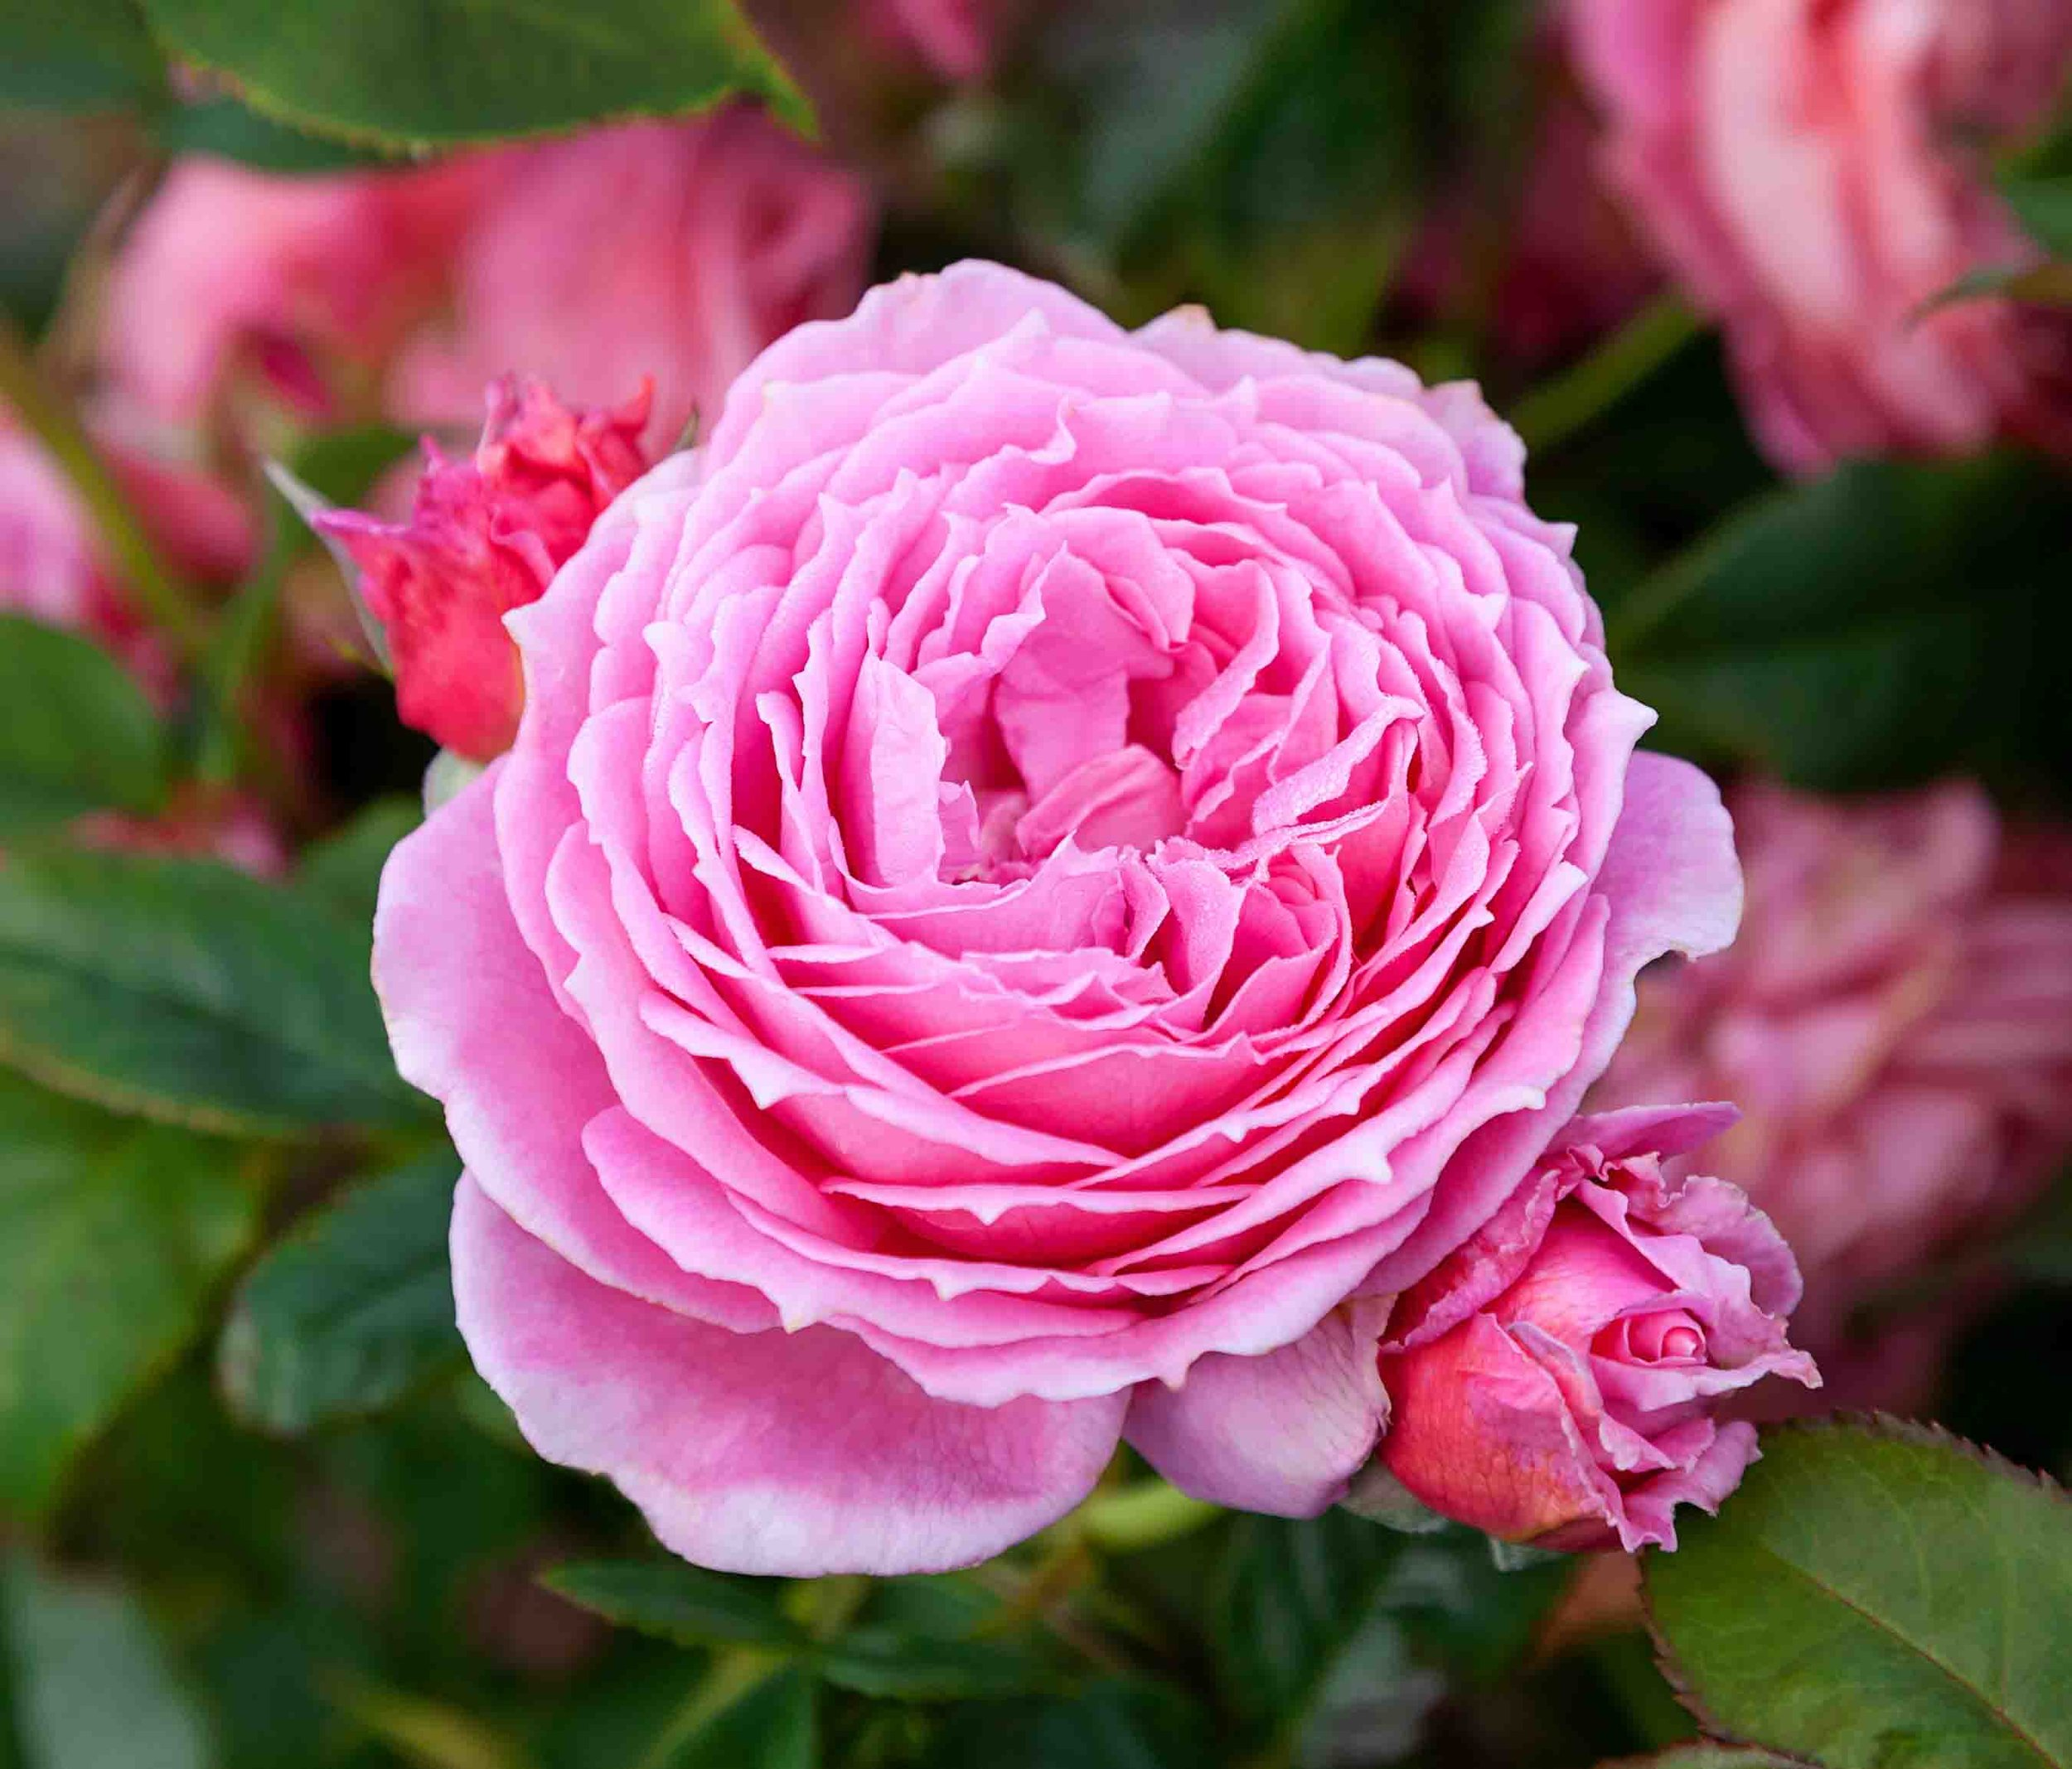 roses-reduced-15.jpg